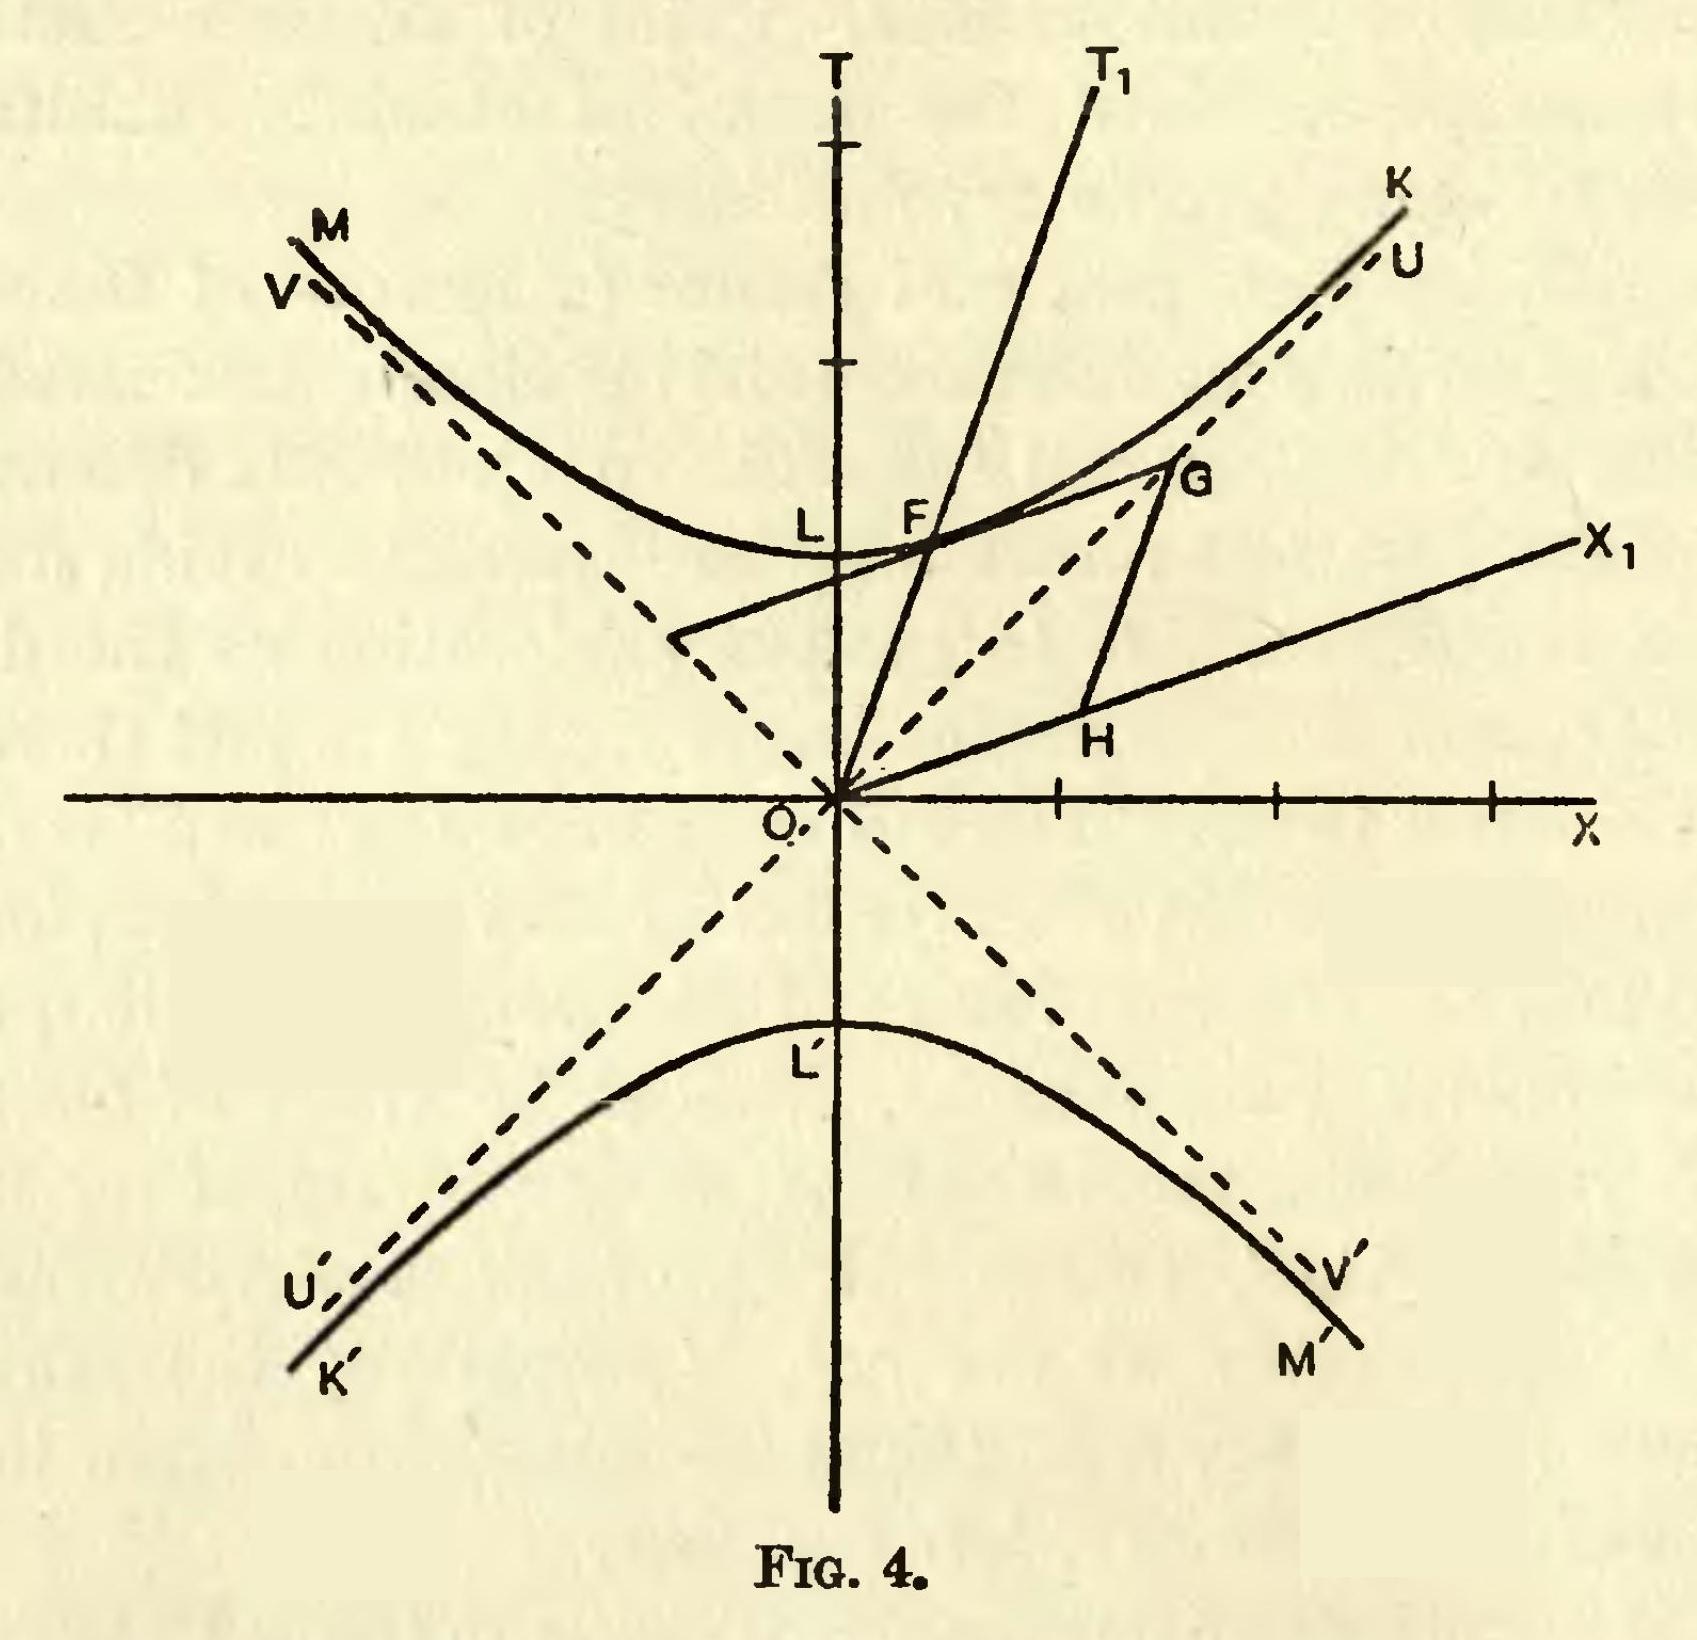 File:Eddington A. Space Time and Gravitation. Fig. 4.jpg ...